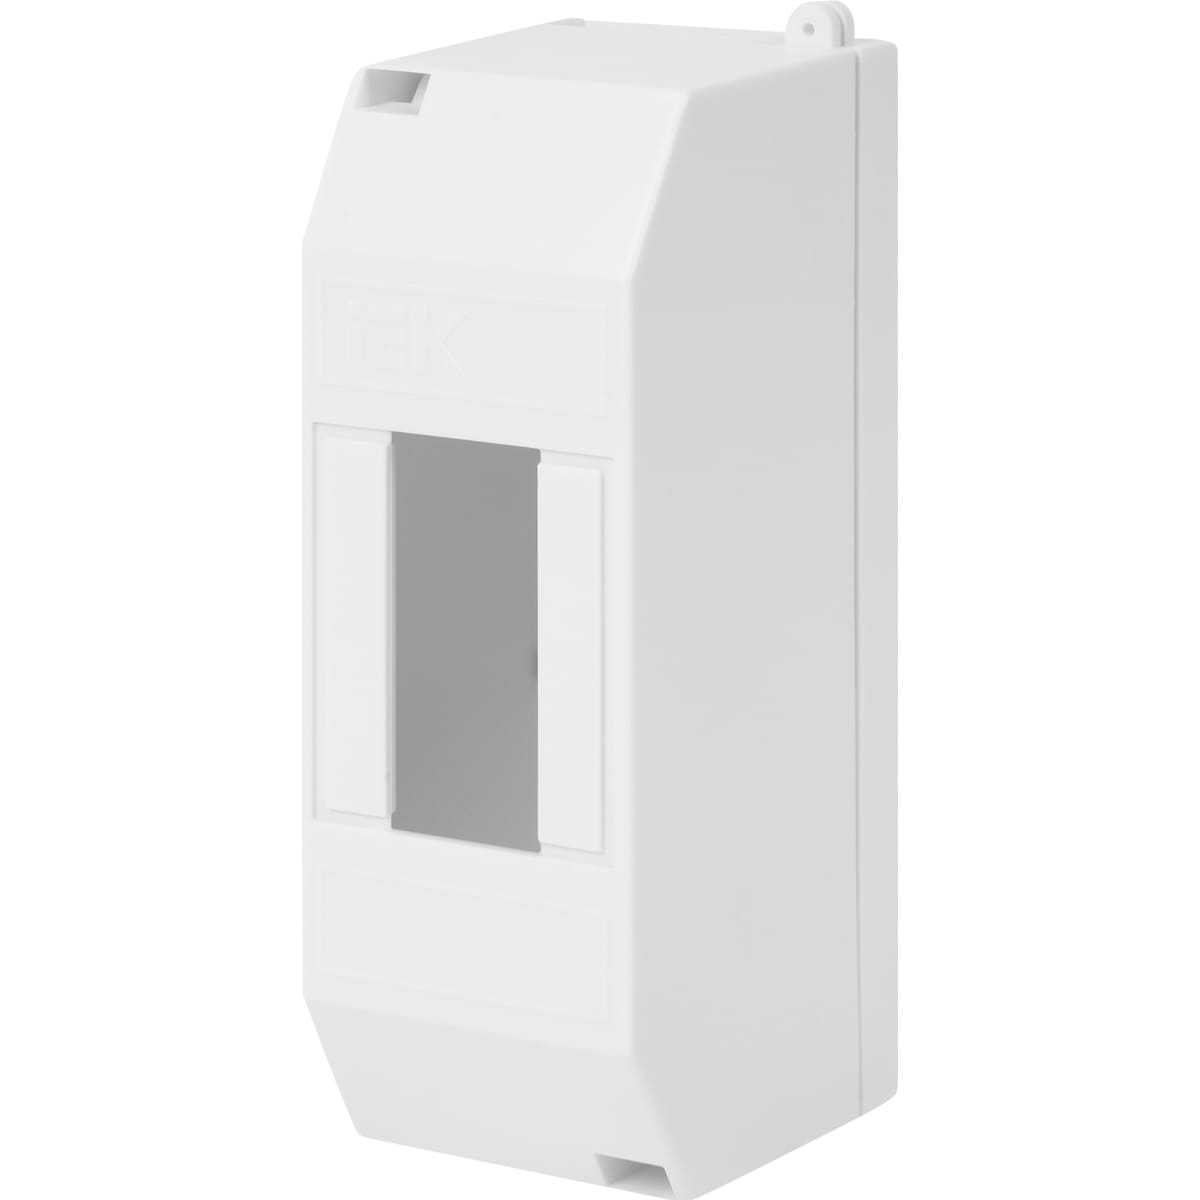 Бокс пластиковый IEK КМПн 1/2 на 2 модуля